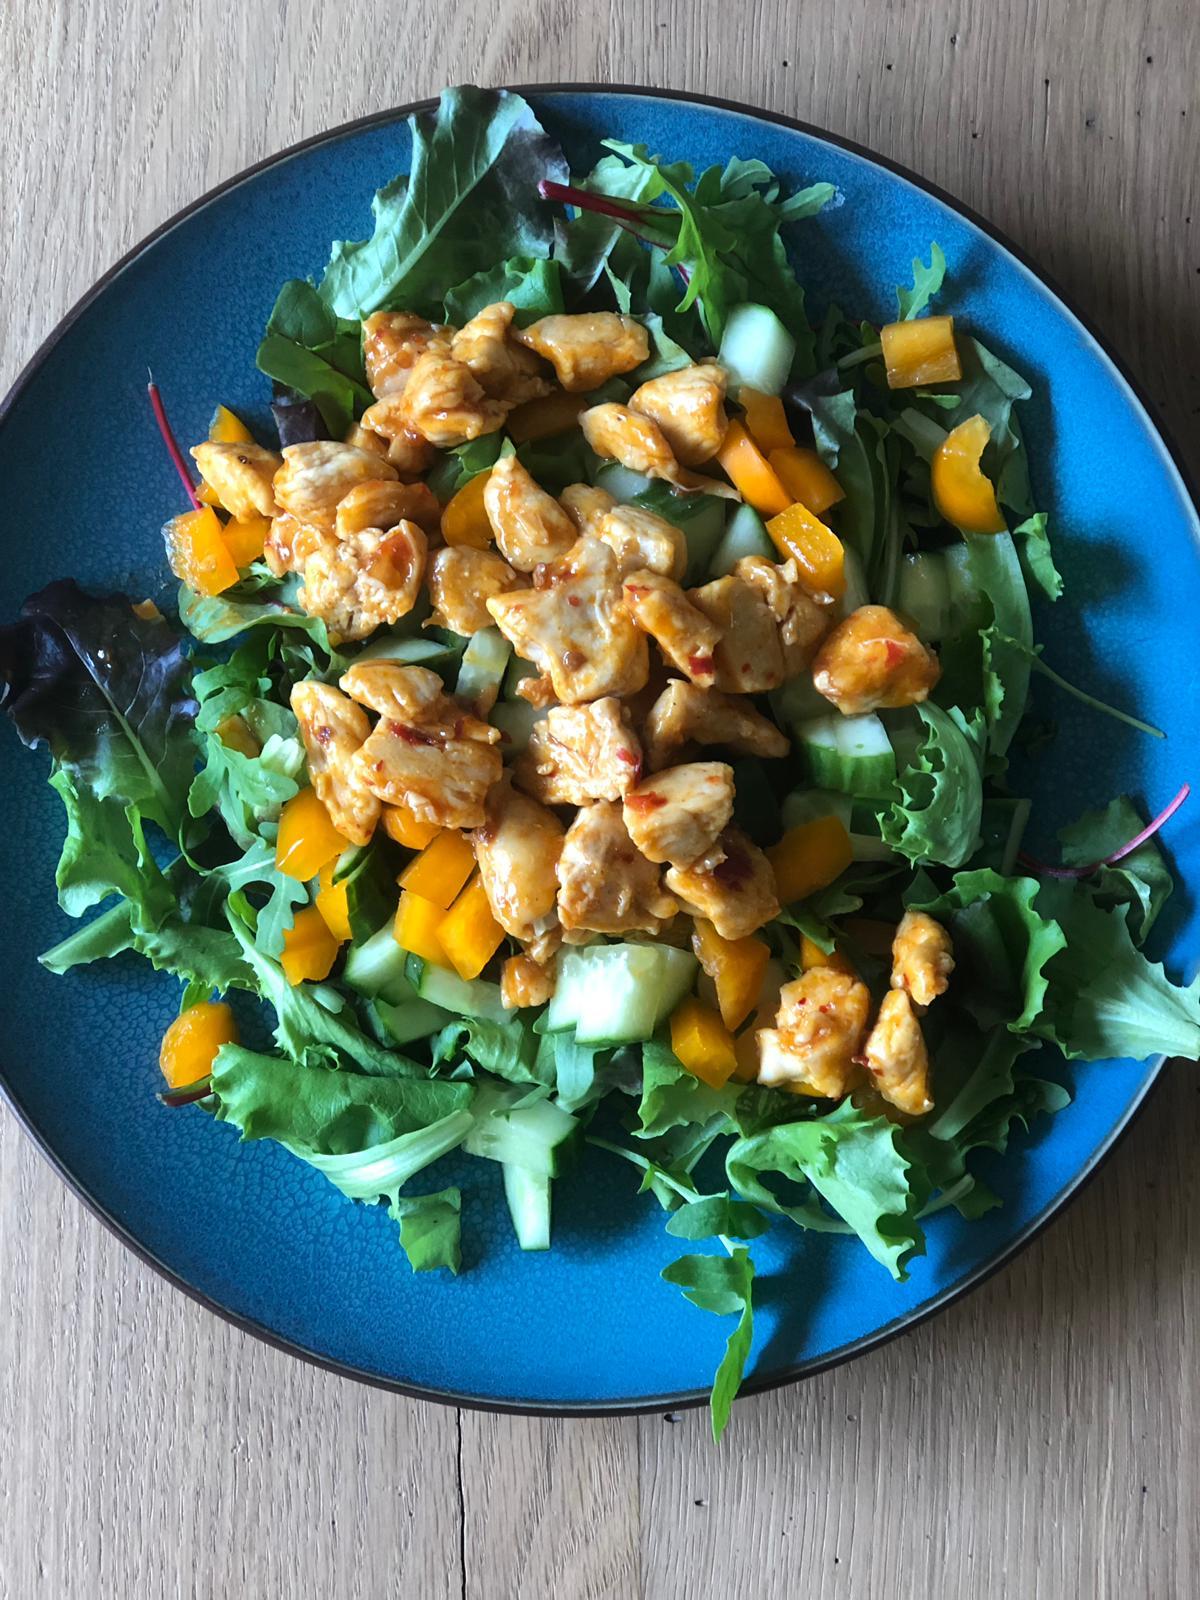 Salade met sweet chili kip